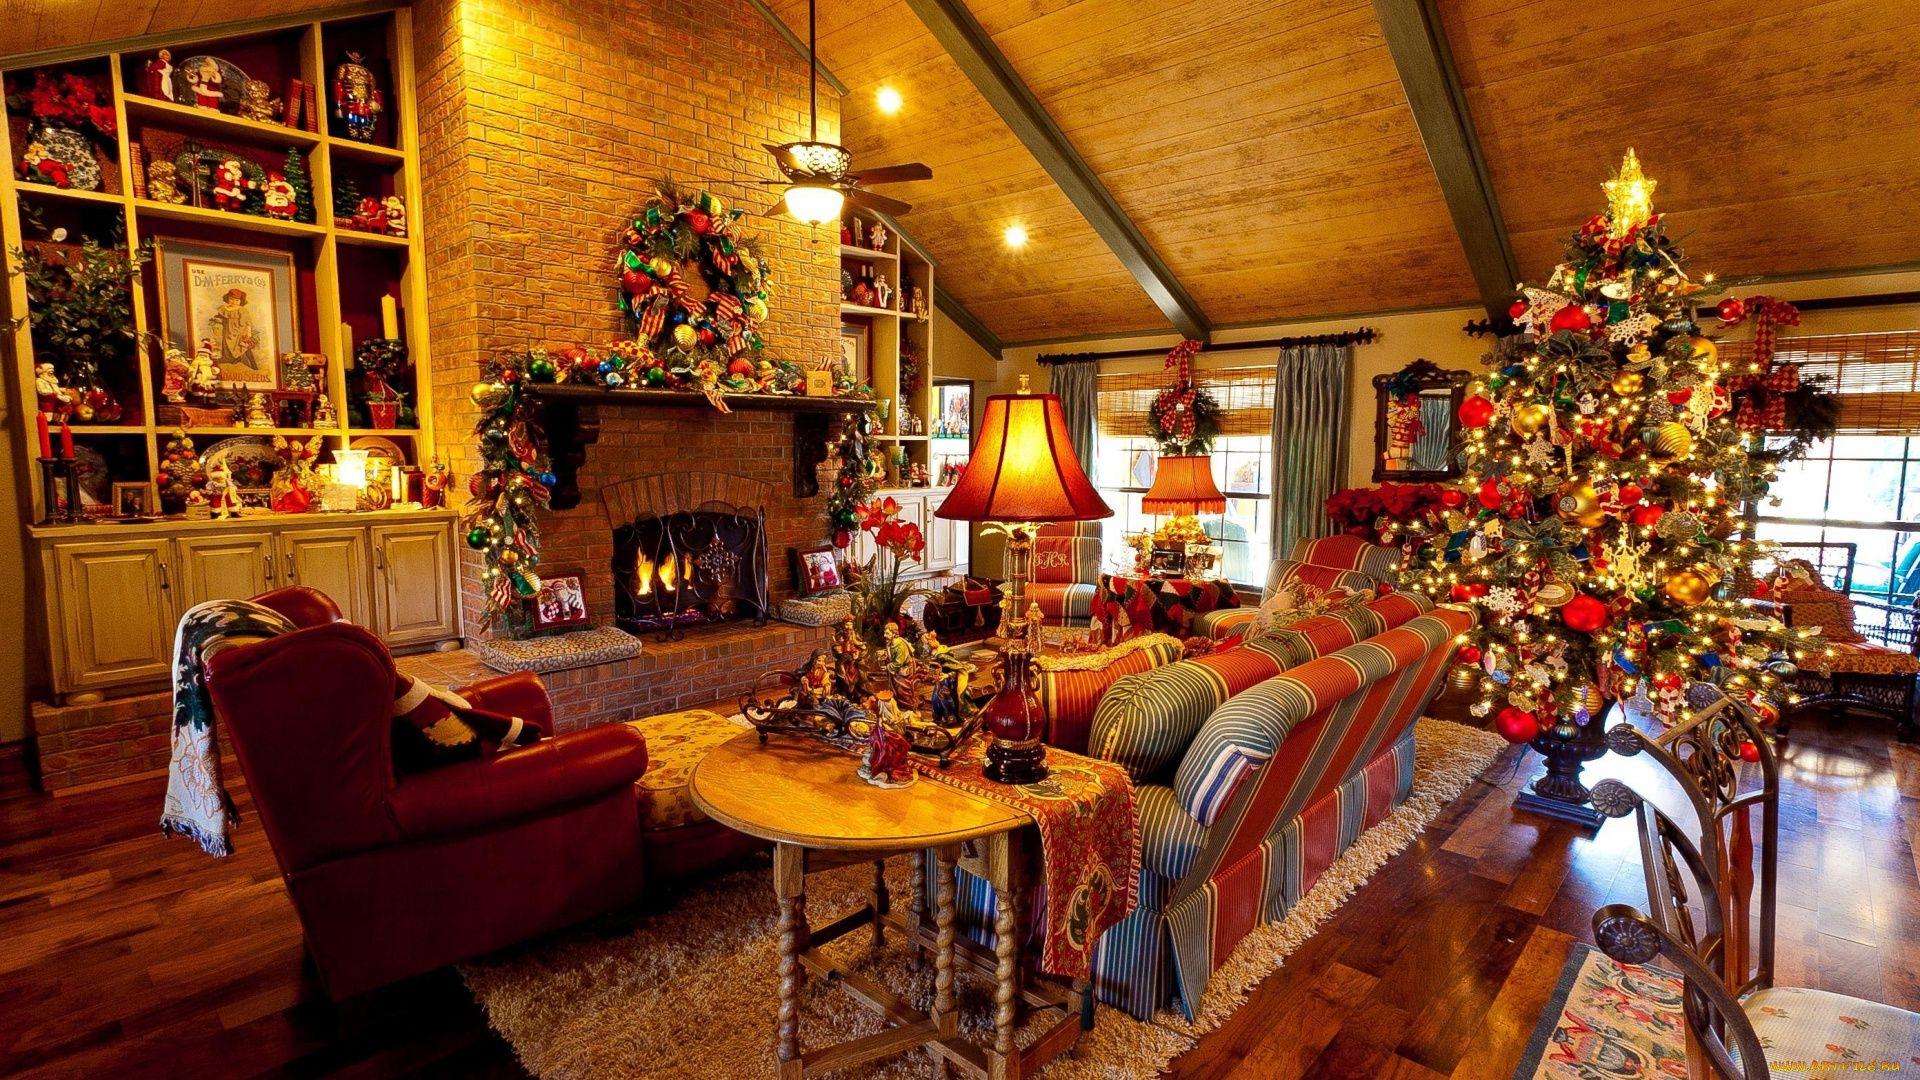 Christmas Fireplace Comfort HD 1080 wallpaper